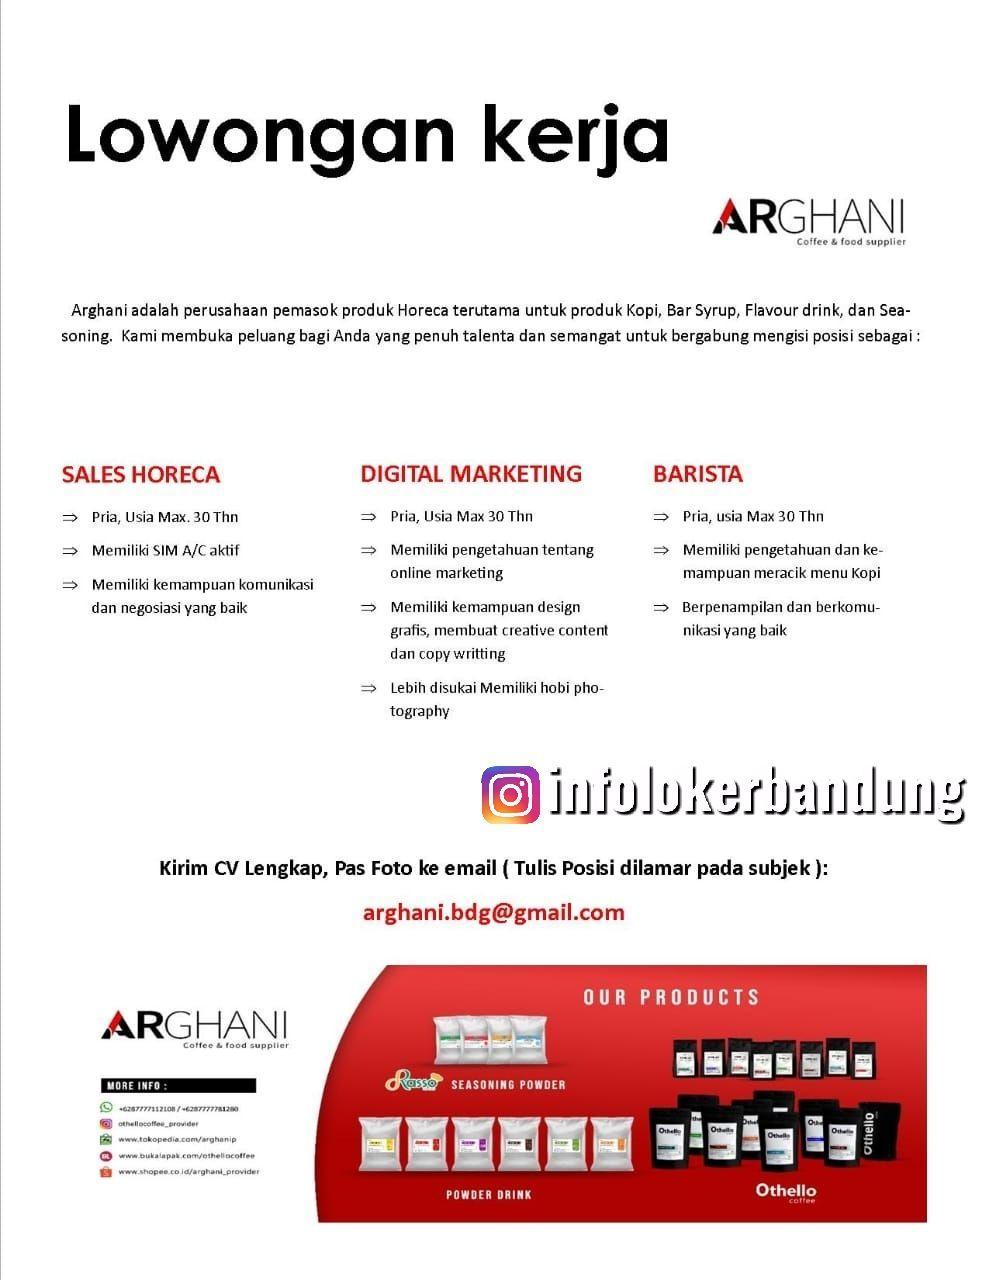 Lowongan Kerja Arghani Coffee & Food Supplier Bandung Januari 2020